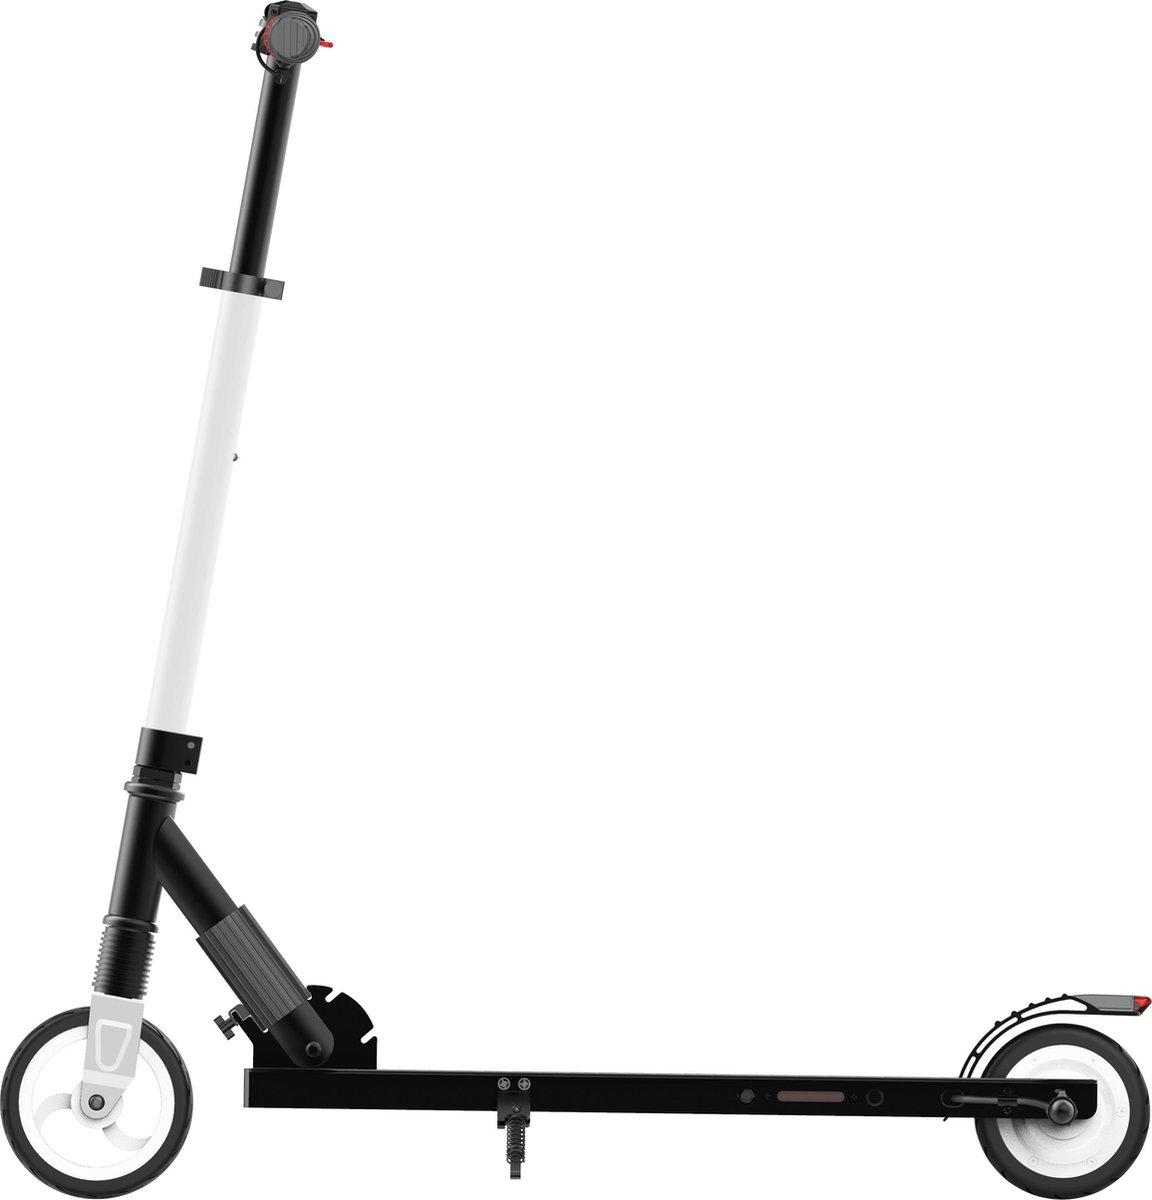 Elektrische step S1 MegaWheels LIGHT E-scooter 23km/u - inklapbaar & in hoogte verstelbaar - Wit